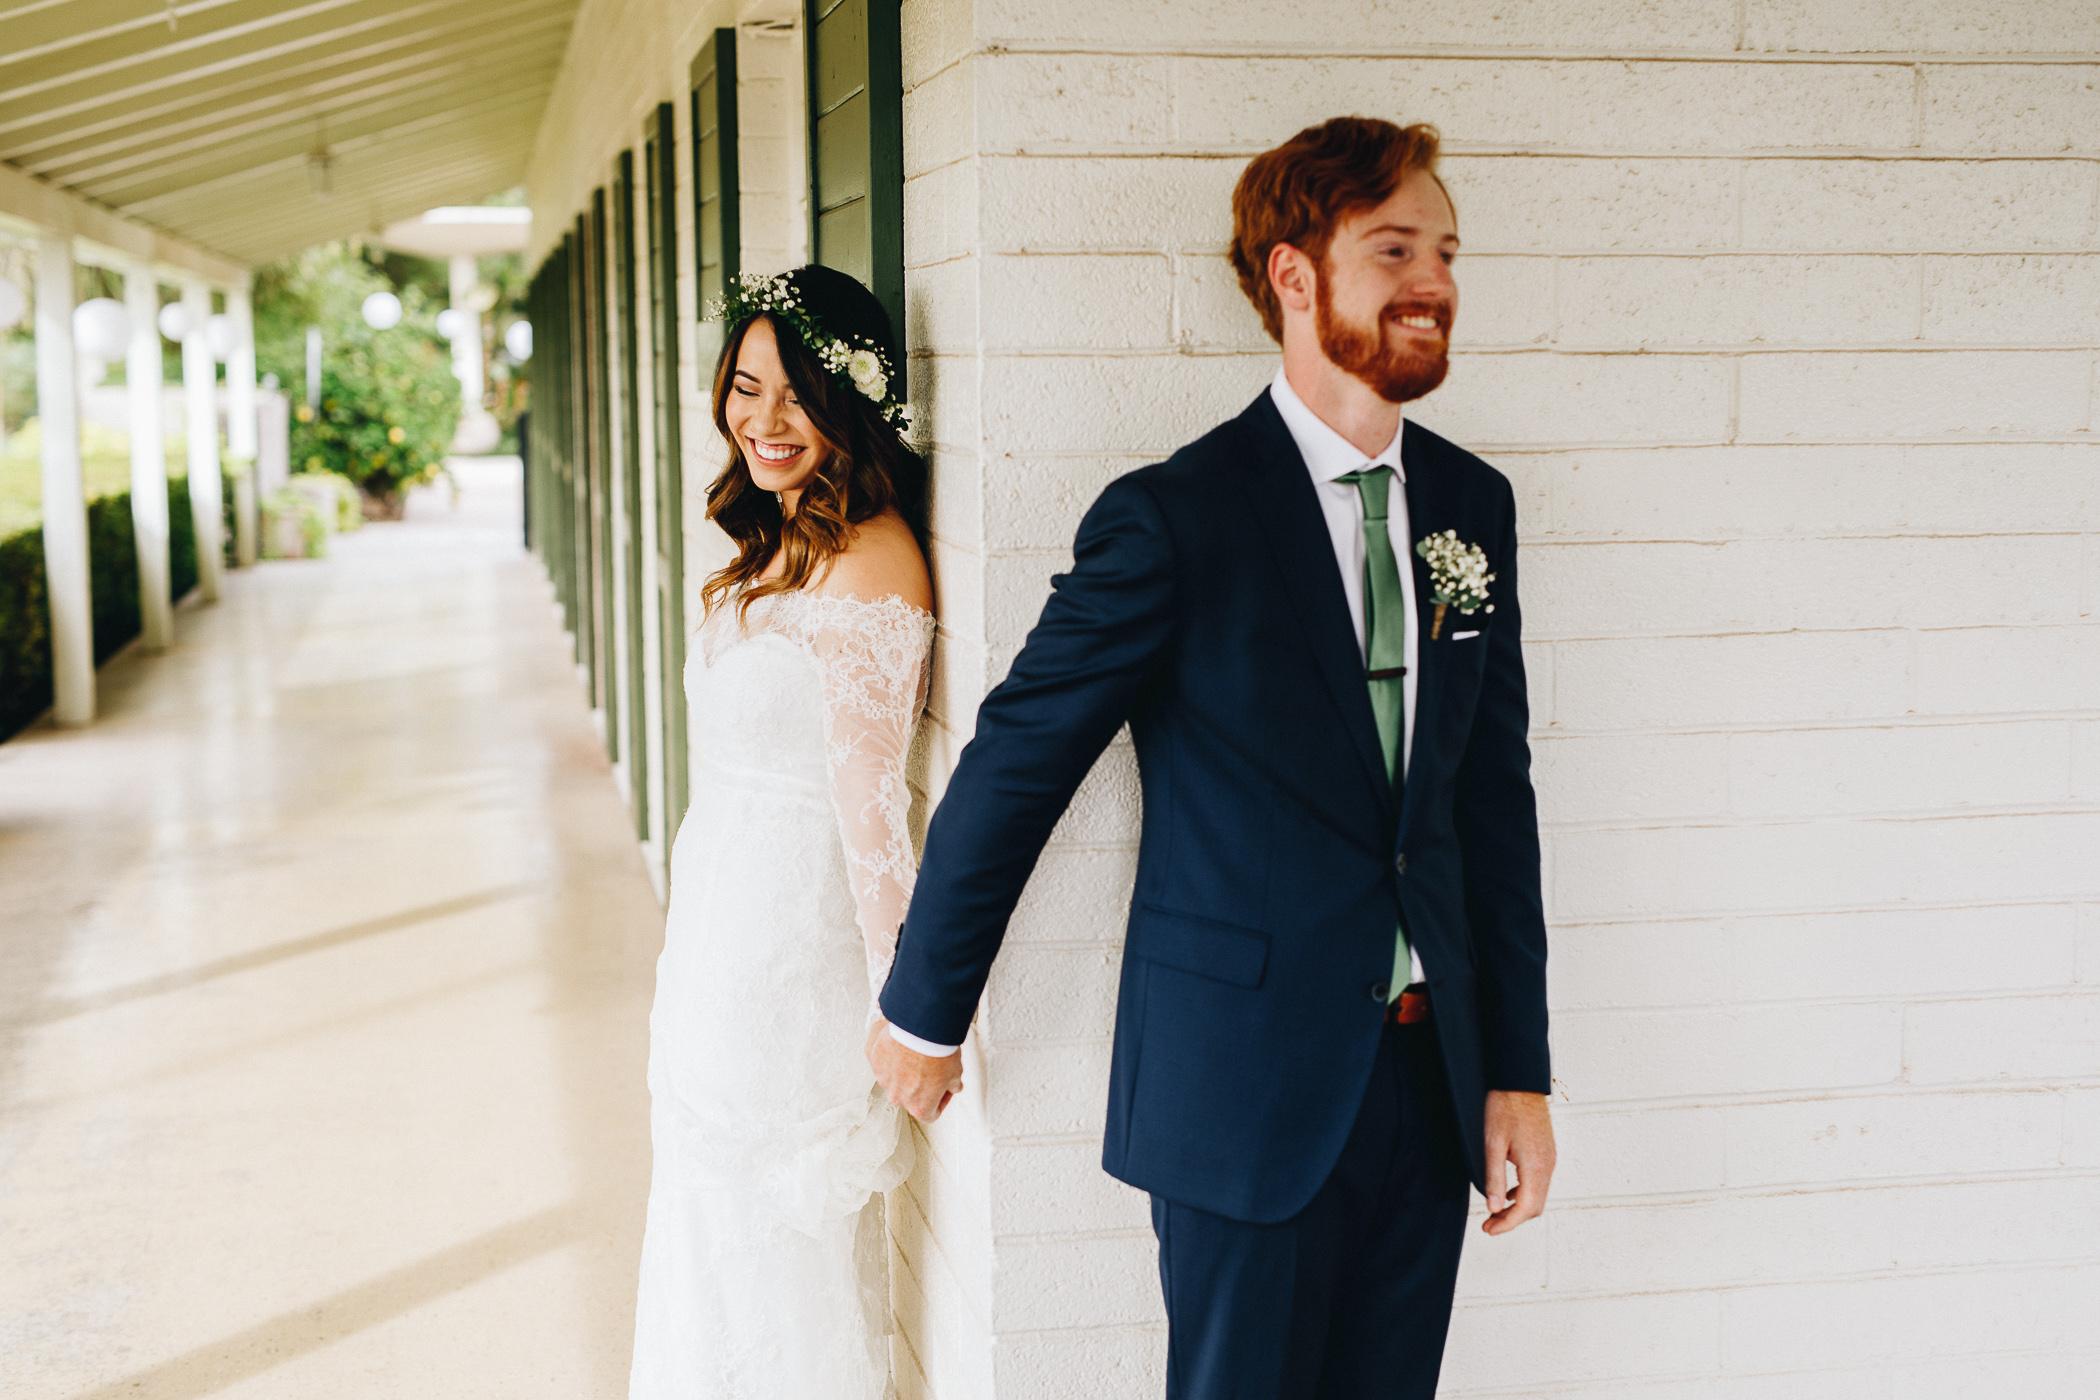 181104-Luxium-Weddings-Arizona-@matt__Le-Brandon-Kariana-Phoenix-Valley-Garden-Center-1042.jpg